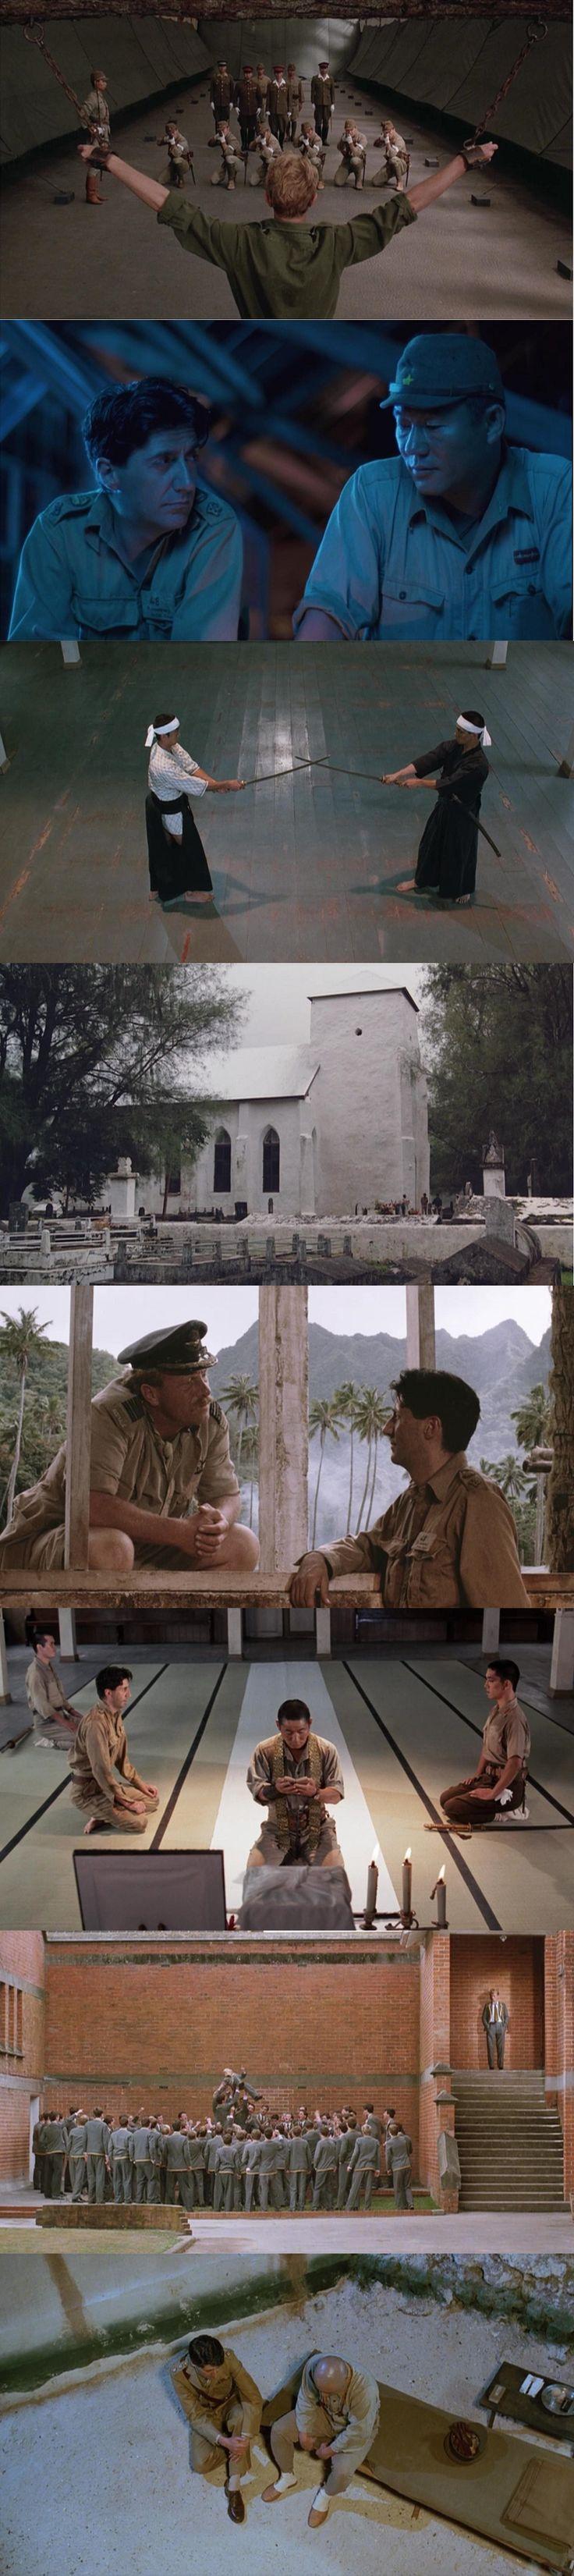 Merry Christmas Mr. Lawrence (1983). Directed by Nagisa Ôshima. Cinematography by Tôichirô Narushima.